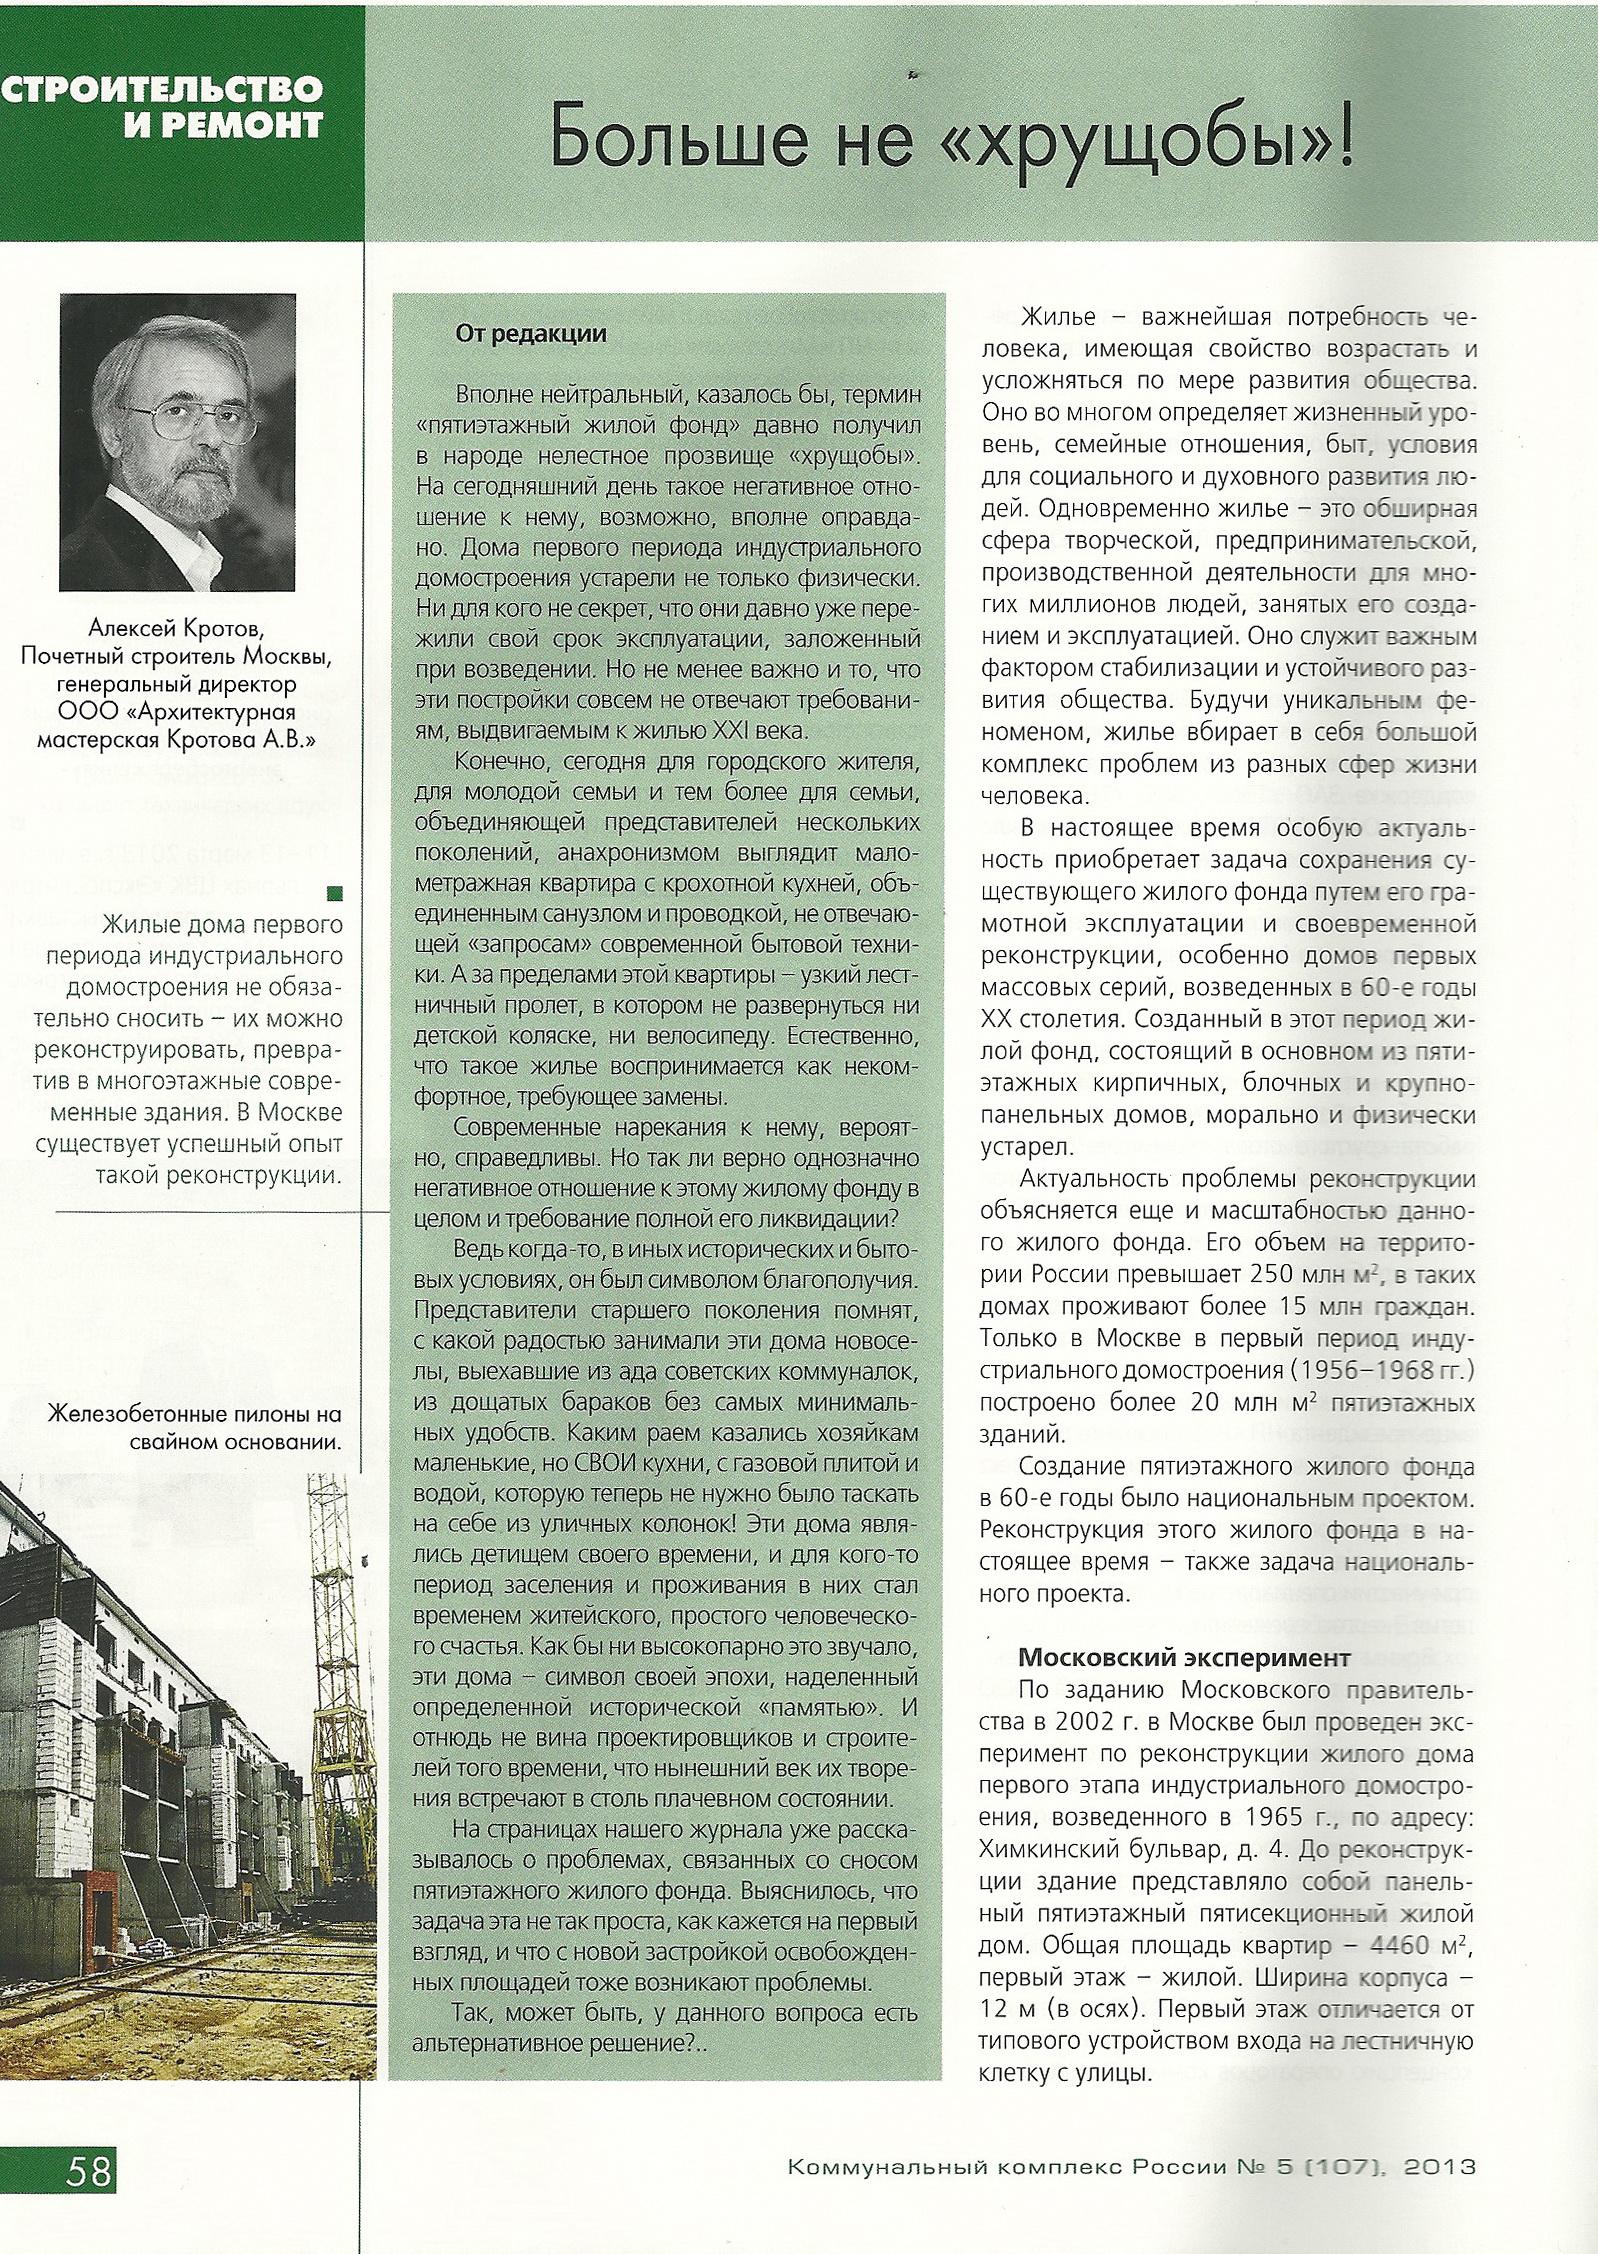 стр 58